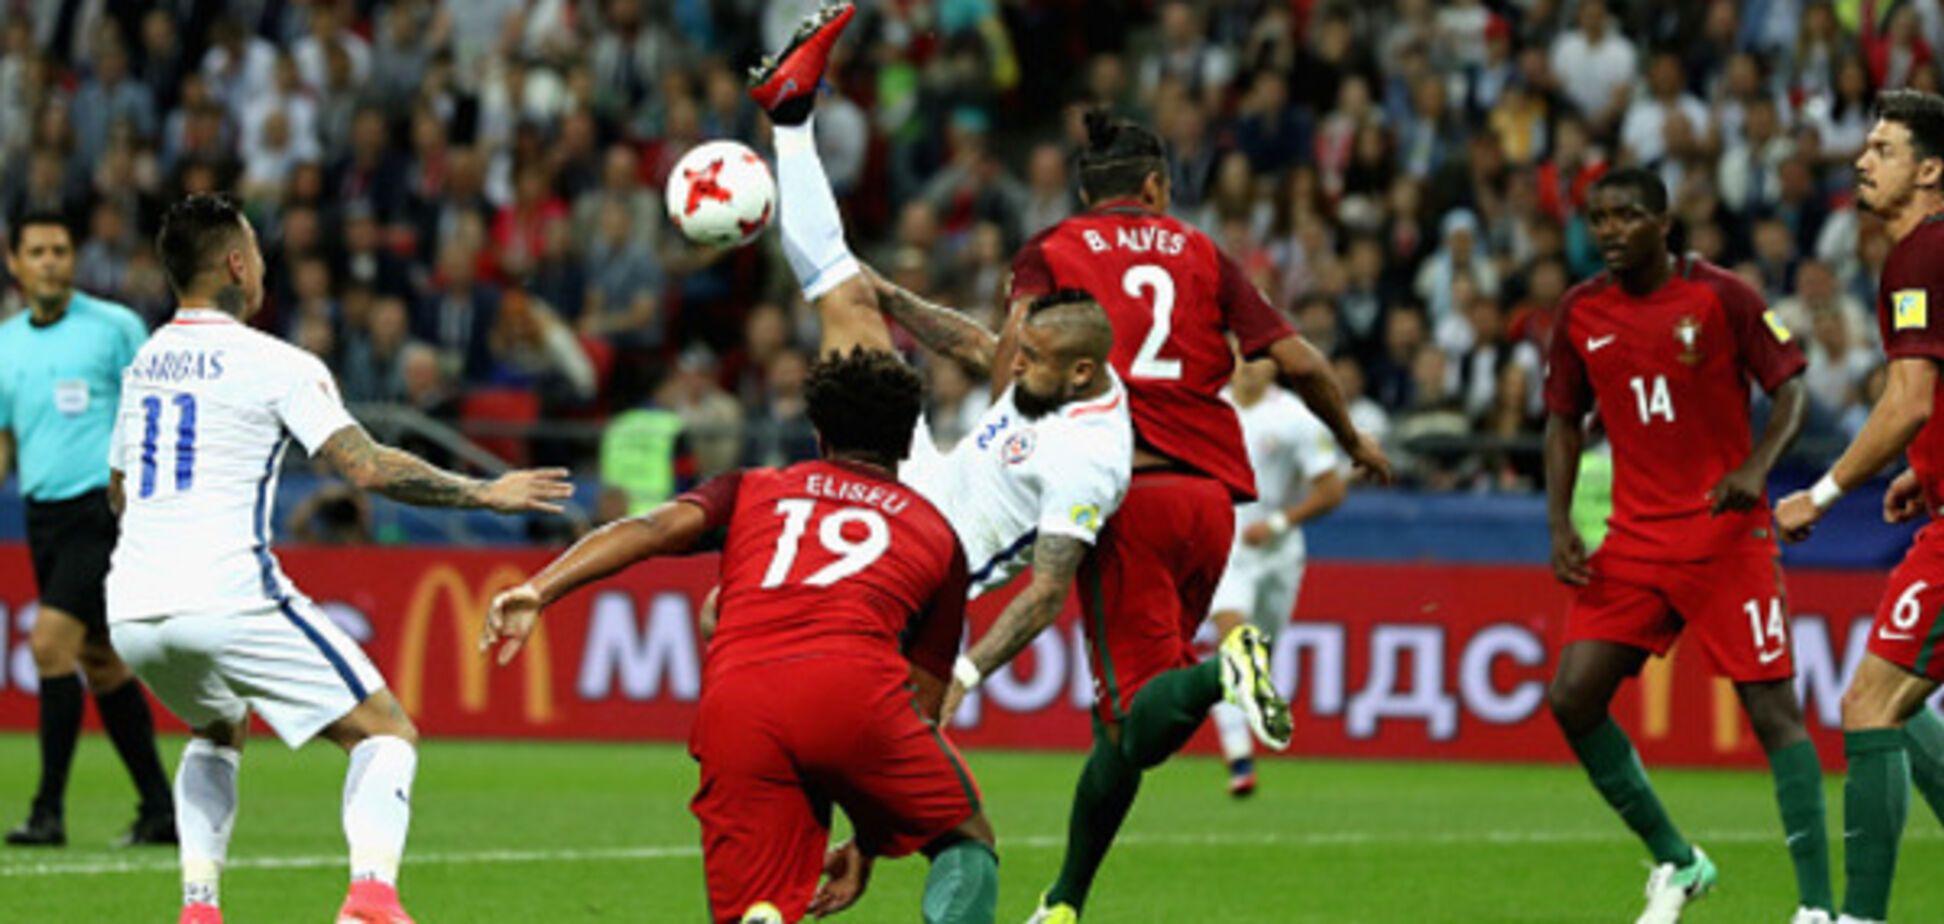 Португалия Чили Кубок Конфедераций